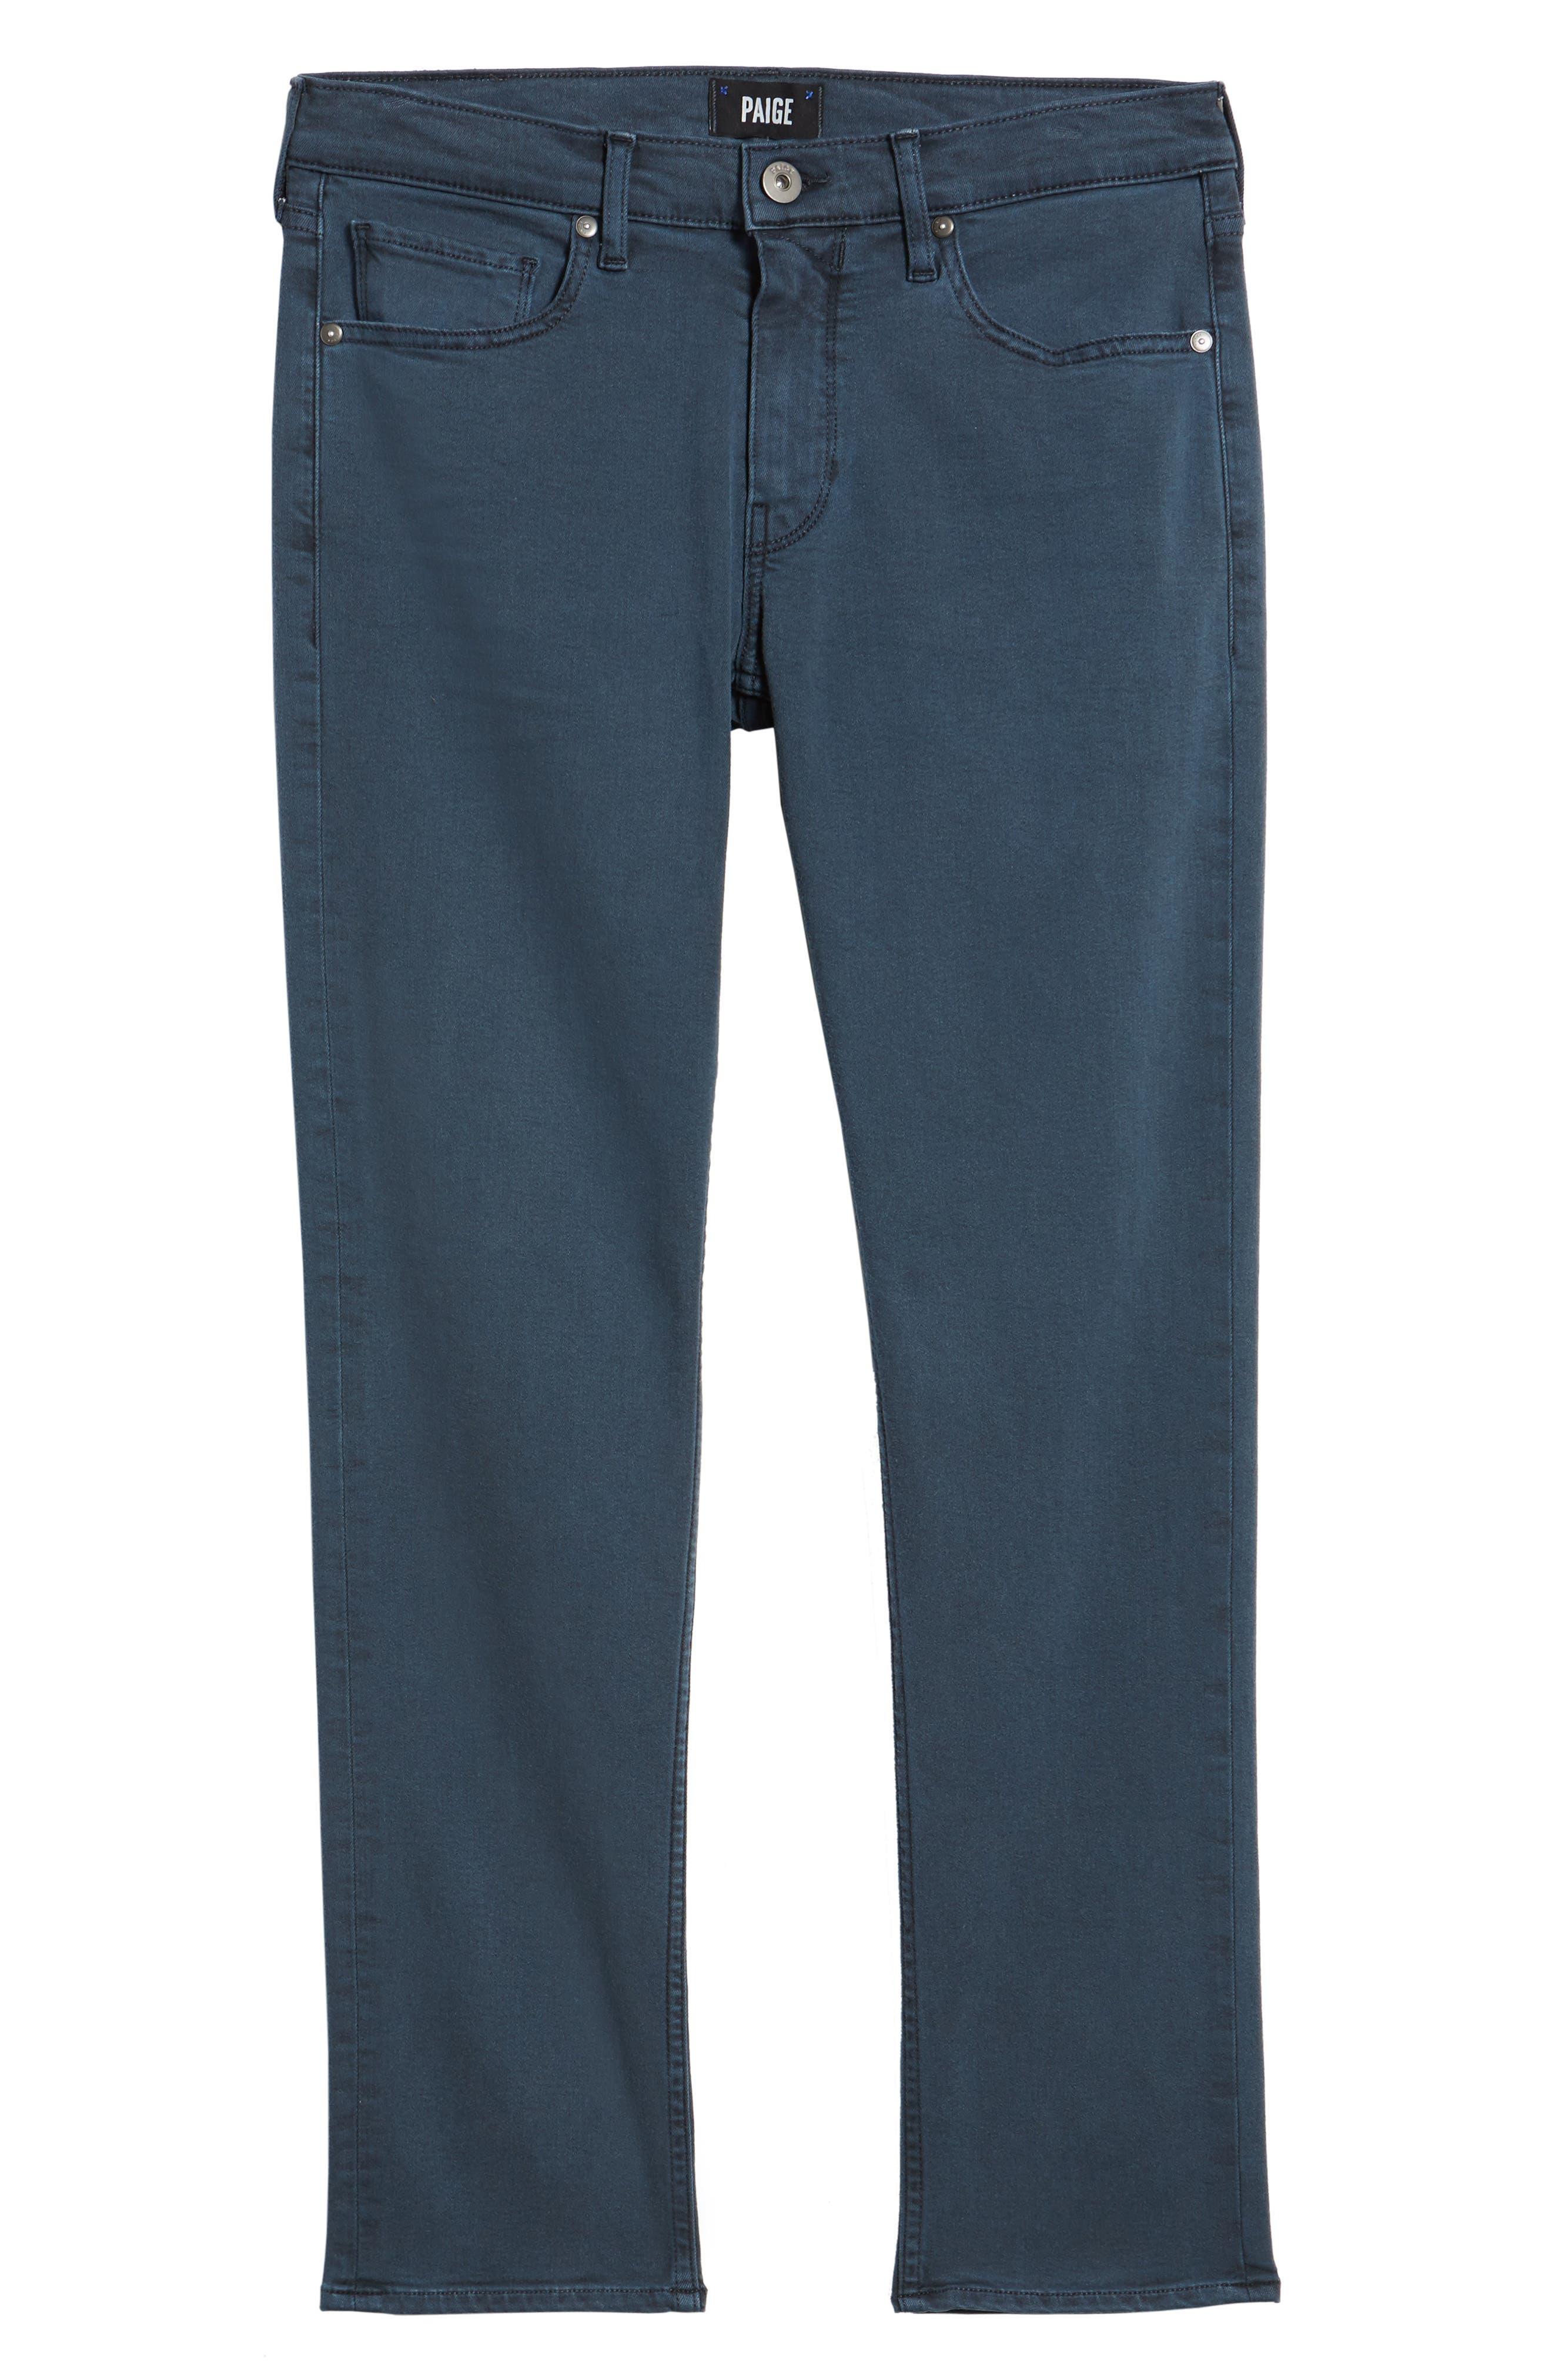 Lennox Slim Fit Jeans,                             Alternate thumbnail 6, color,                             Vintage Amalfi